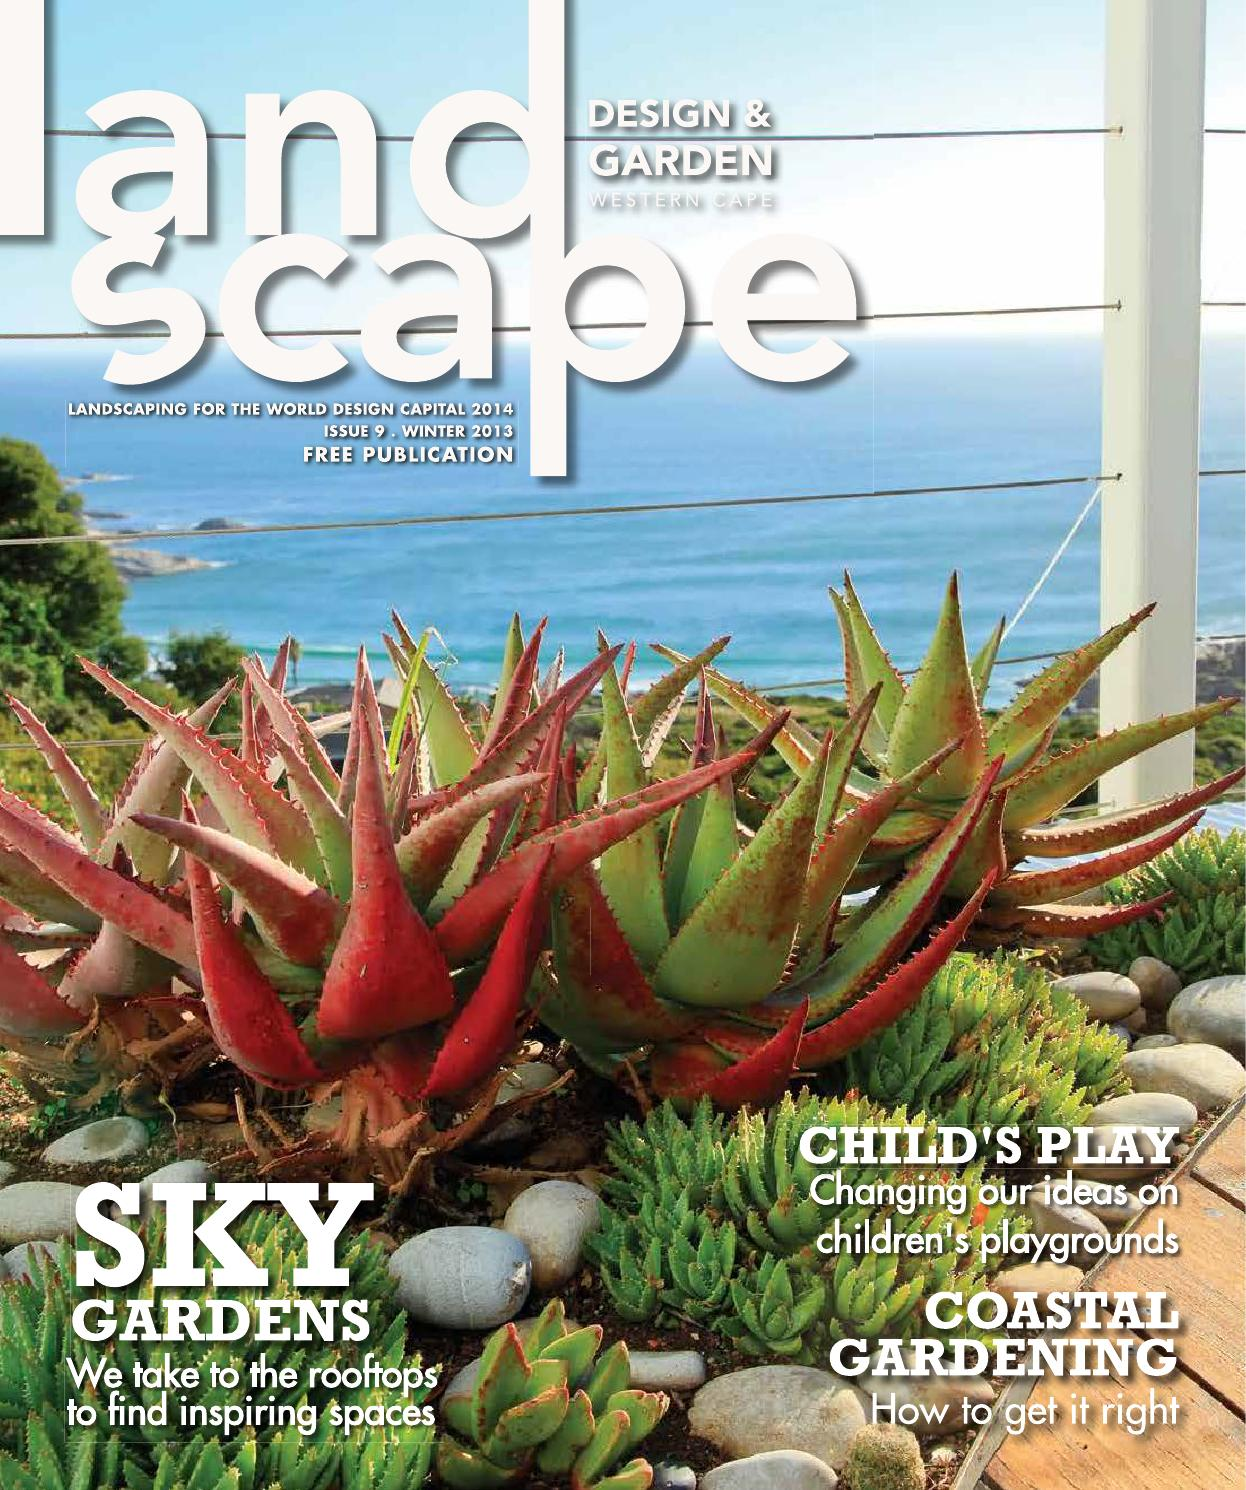 landscape design and garden winter 2013 by landscape